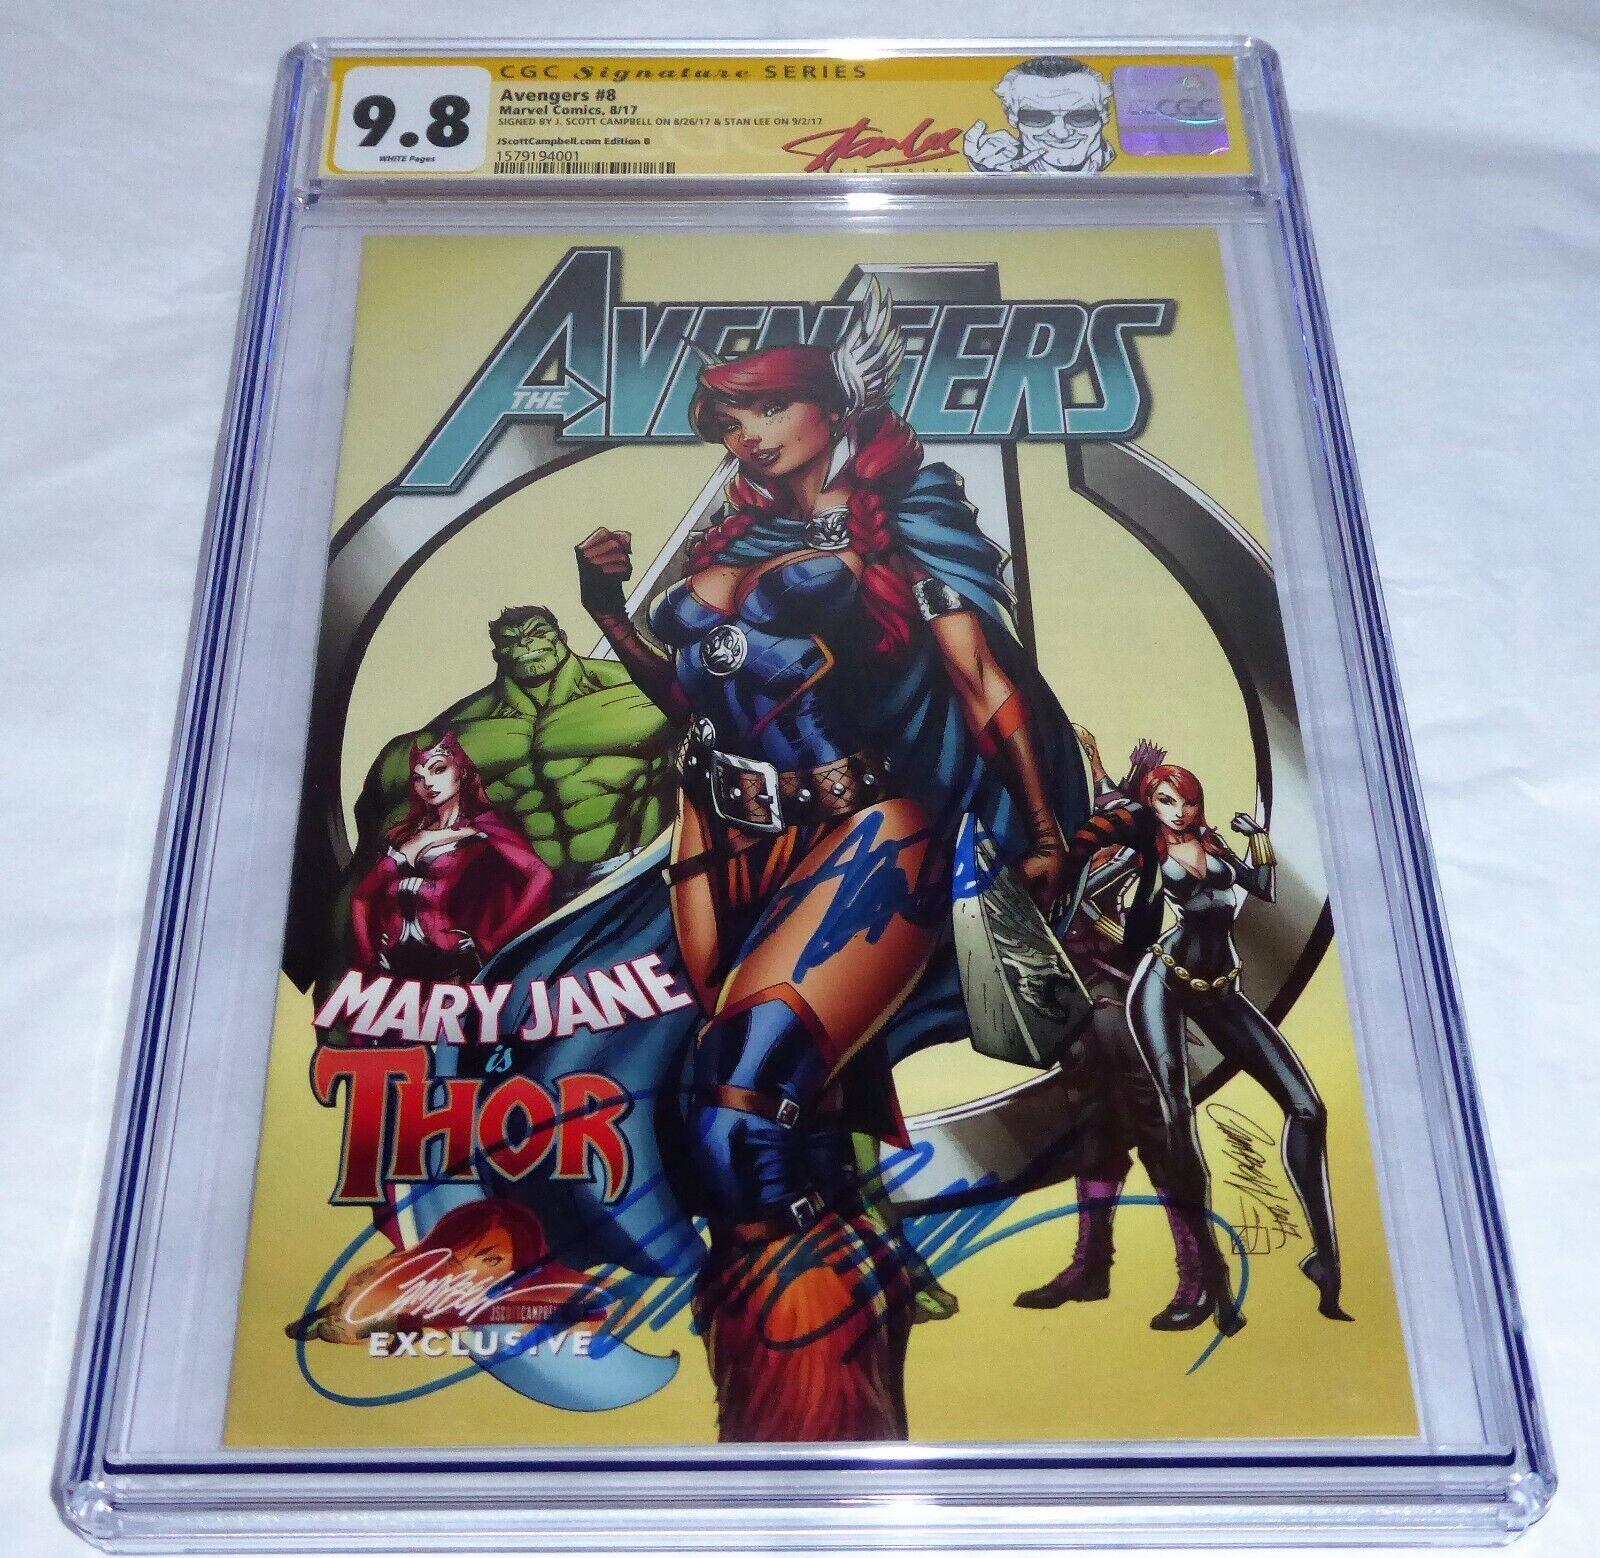 Avengers #8 CGC SS Signature Autograph STAN LEE JScottCampbell Edition B Variant